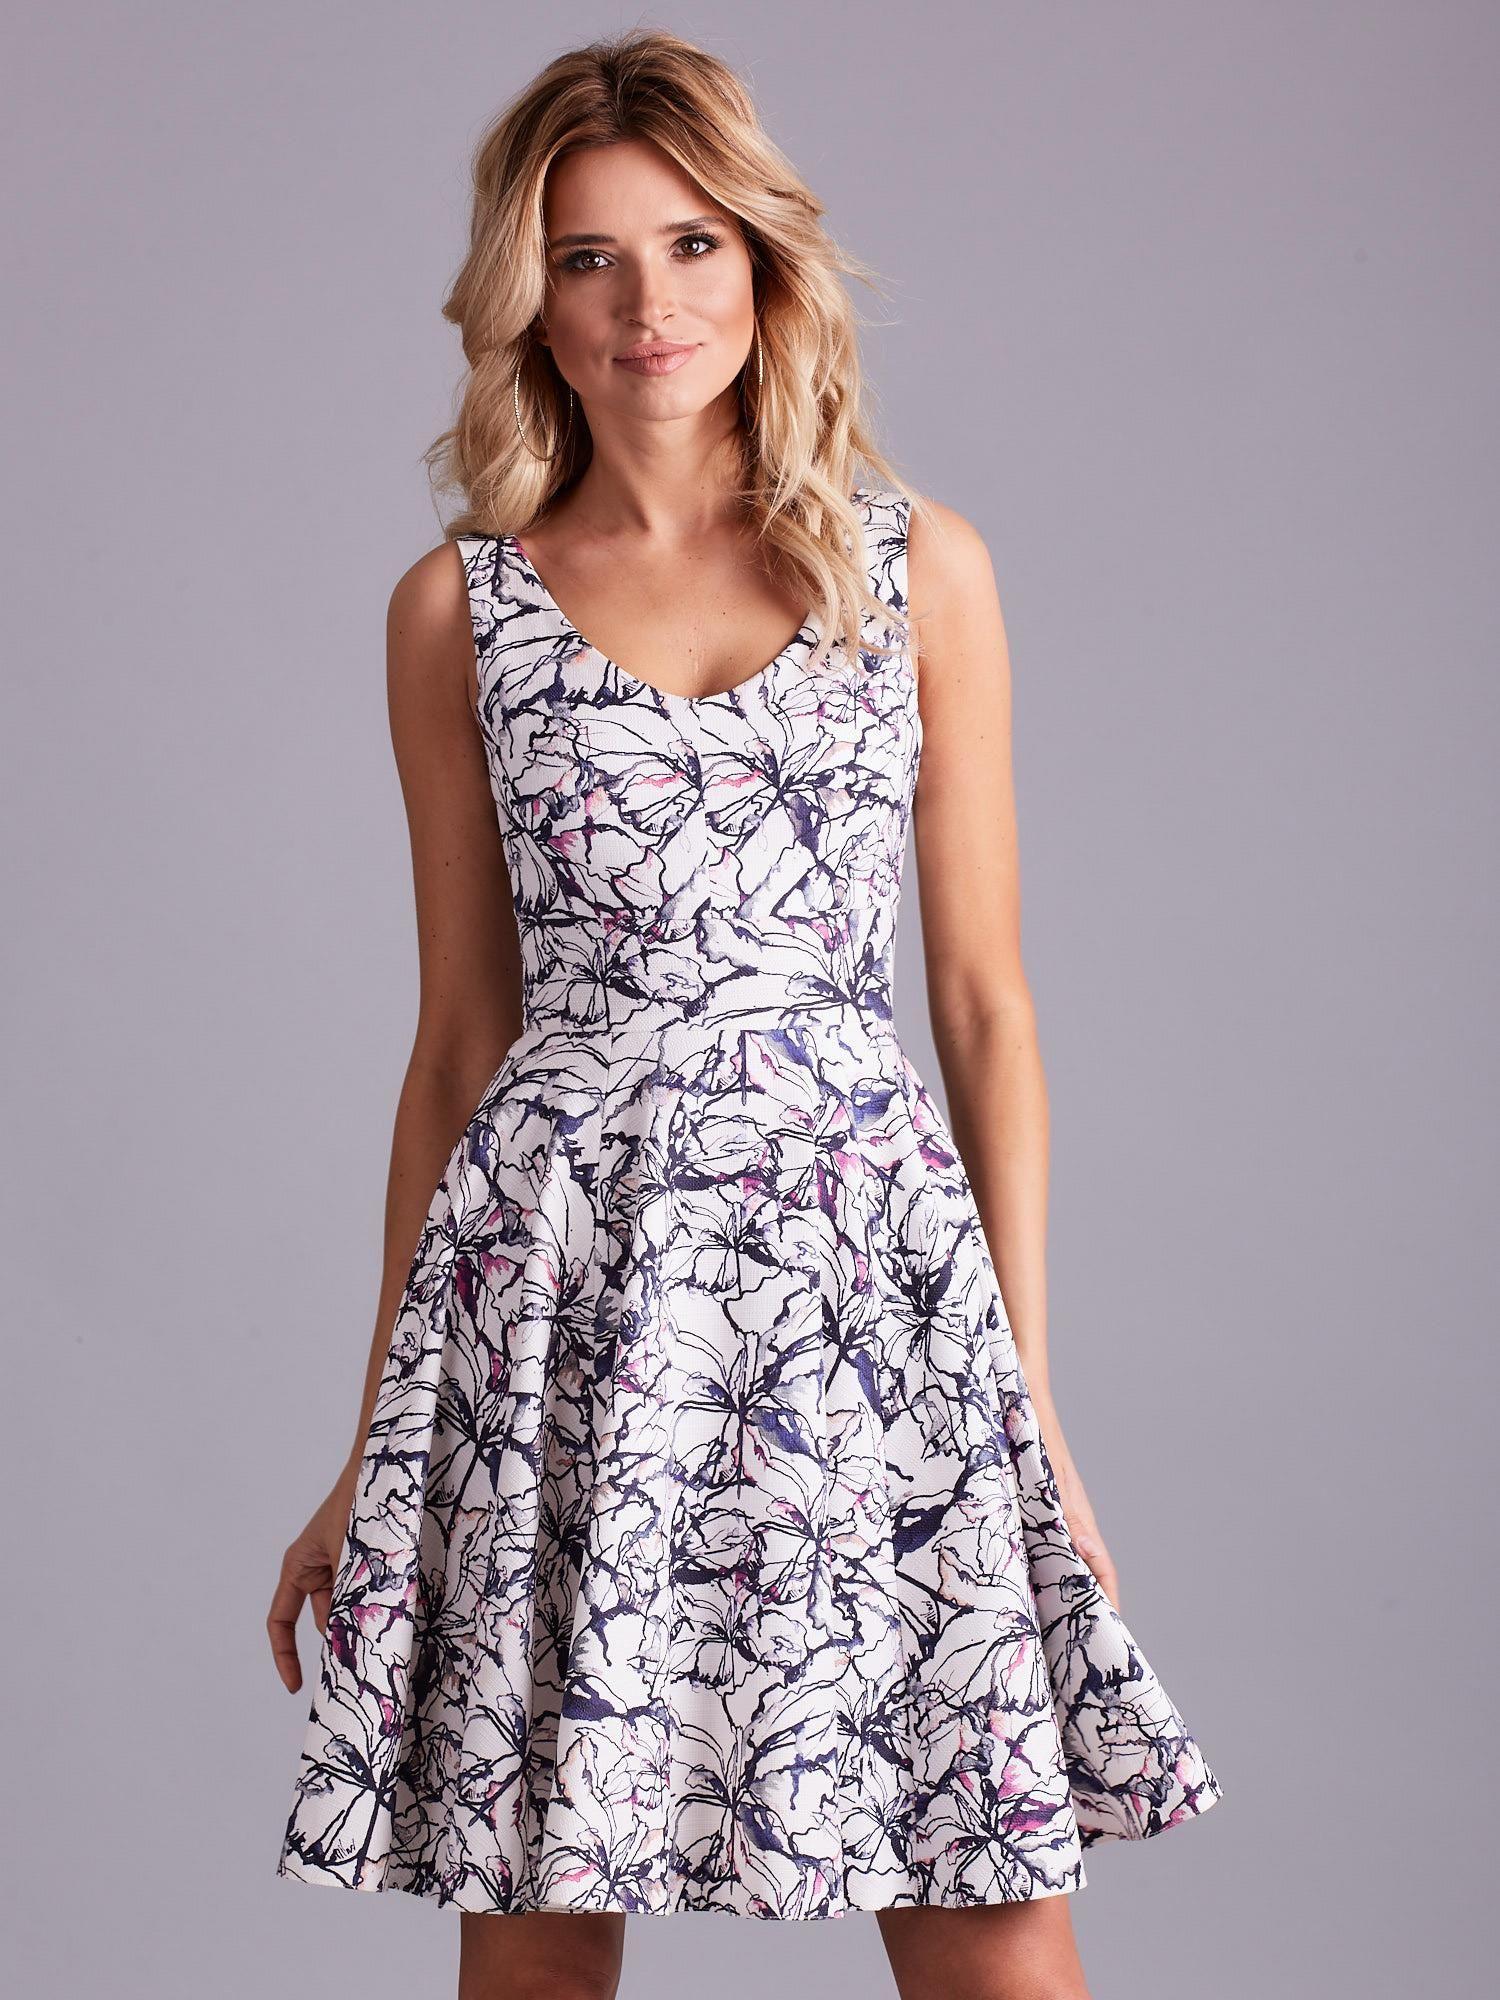 05e97f9c9e Biała rozkloszowana sukienka we wzory - Sukienka rozkloszowana ...